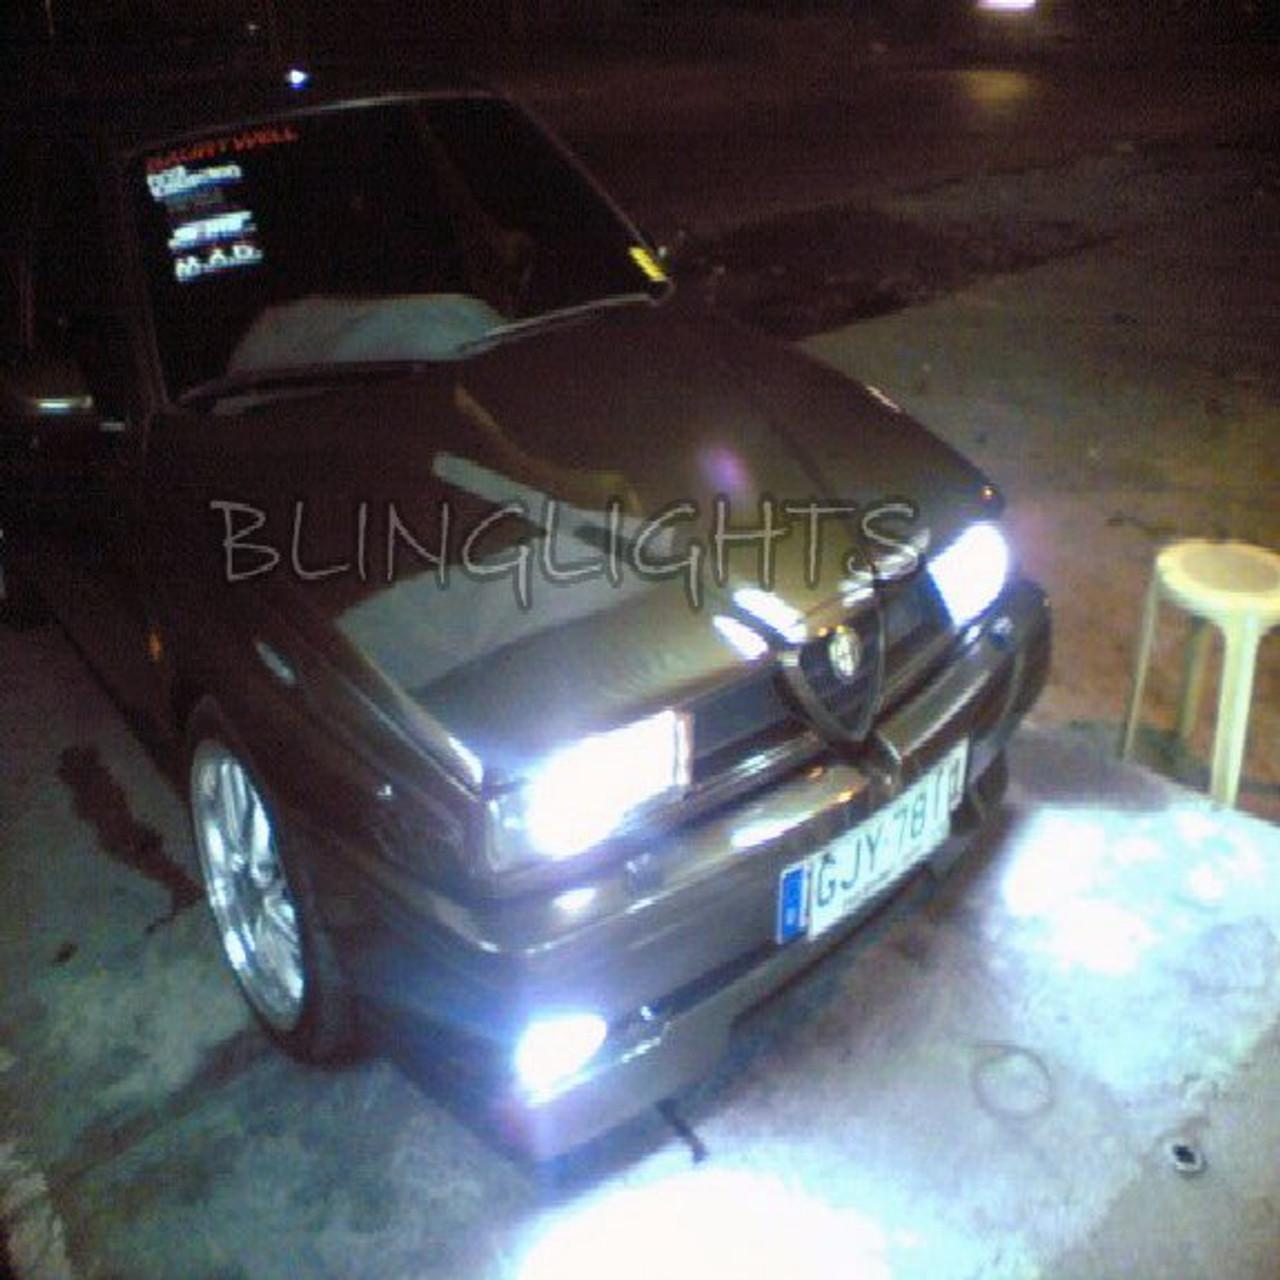 1992 1993 1994 1995 1996 1997 1998 Alfa Romeo 155 Xenon Fog Lamps Driving Lights Foglamps Kit